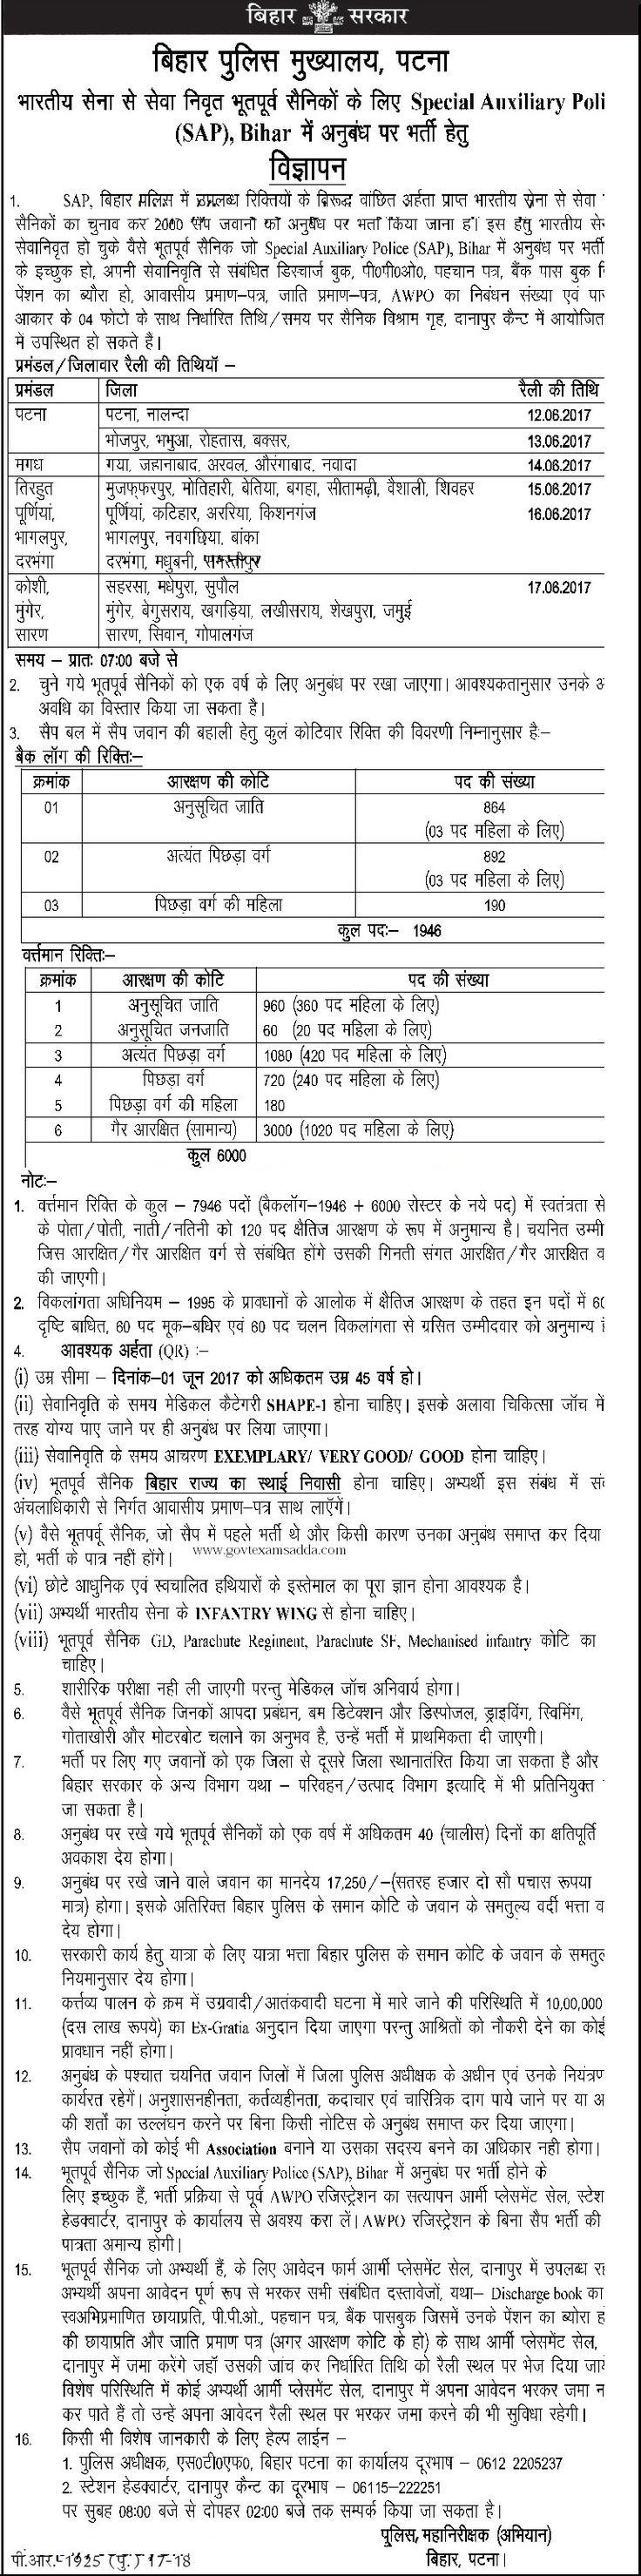 Bihar SAP Recruitment 2017, Bihar Police 7946 Special Auxiliary Police Vacancies Rally, Bihar Police online Application Form 2017, check eligibility PST